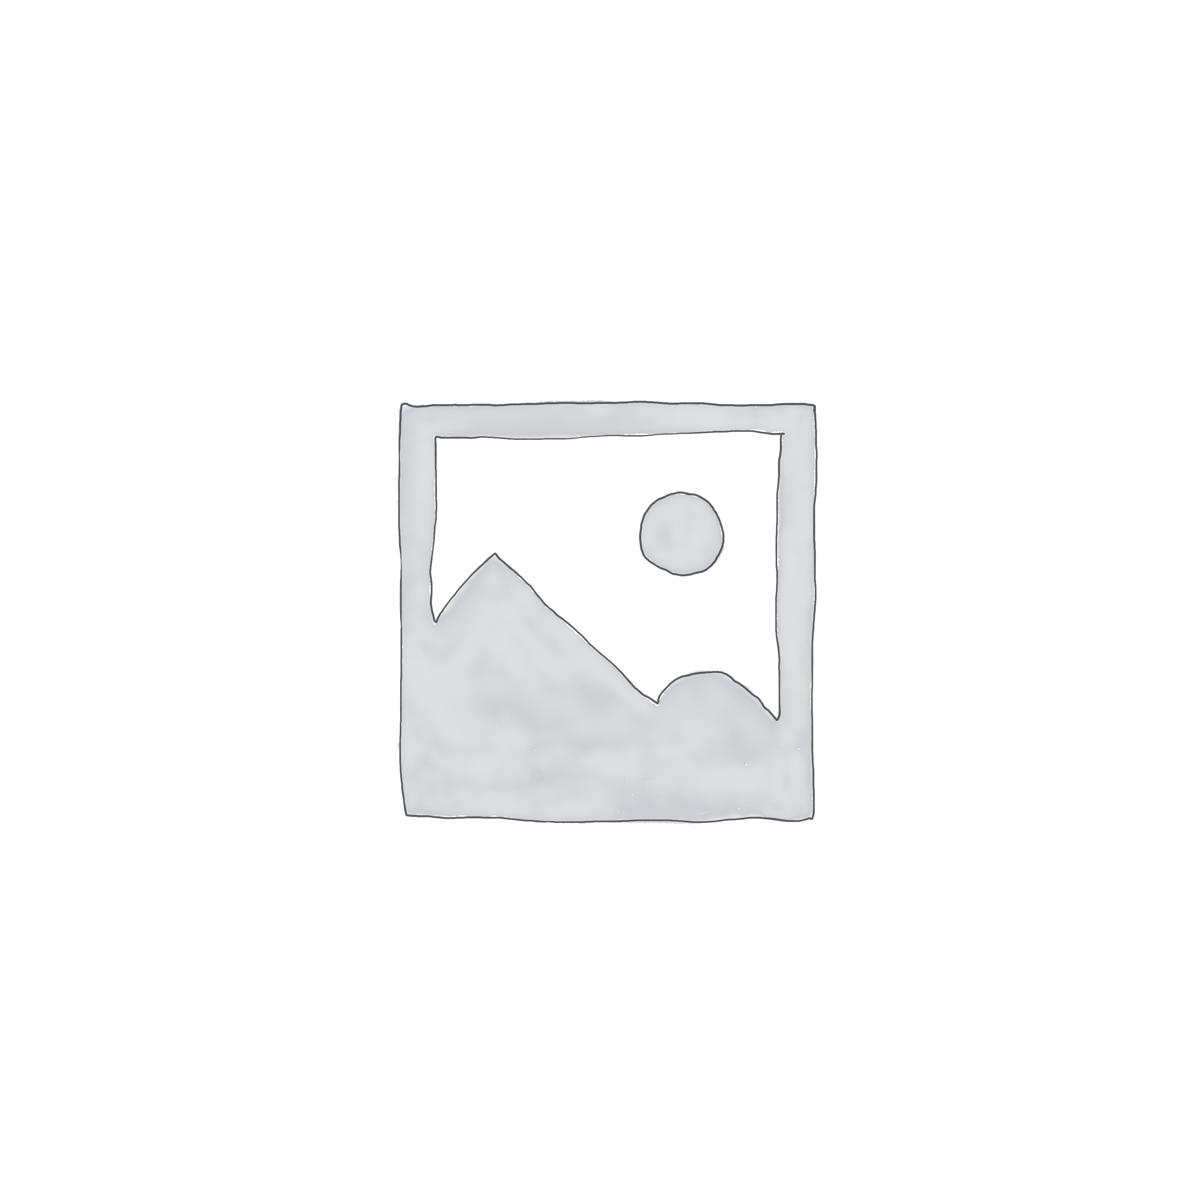 Szublimacios Termosz 750ml